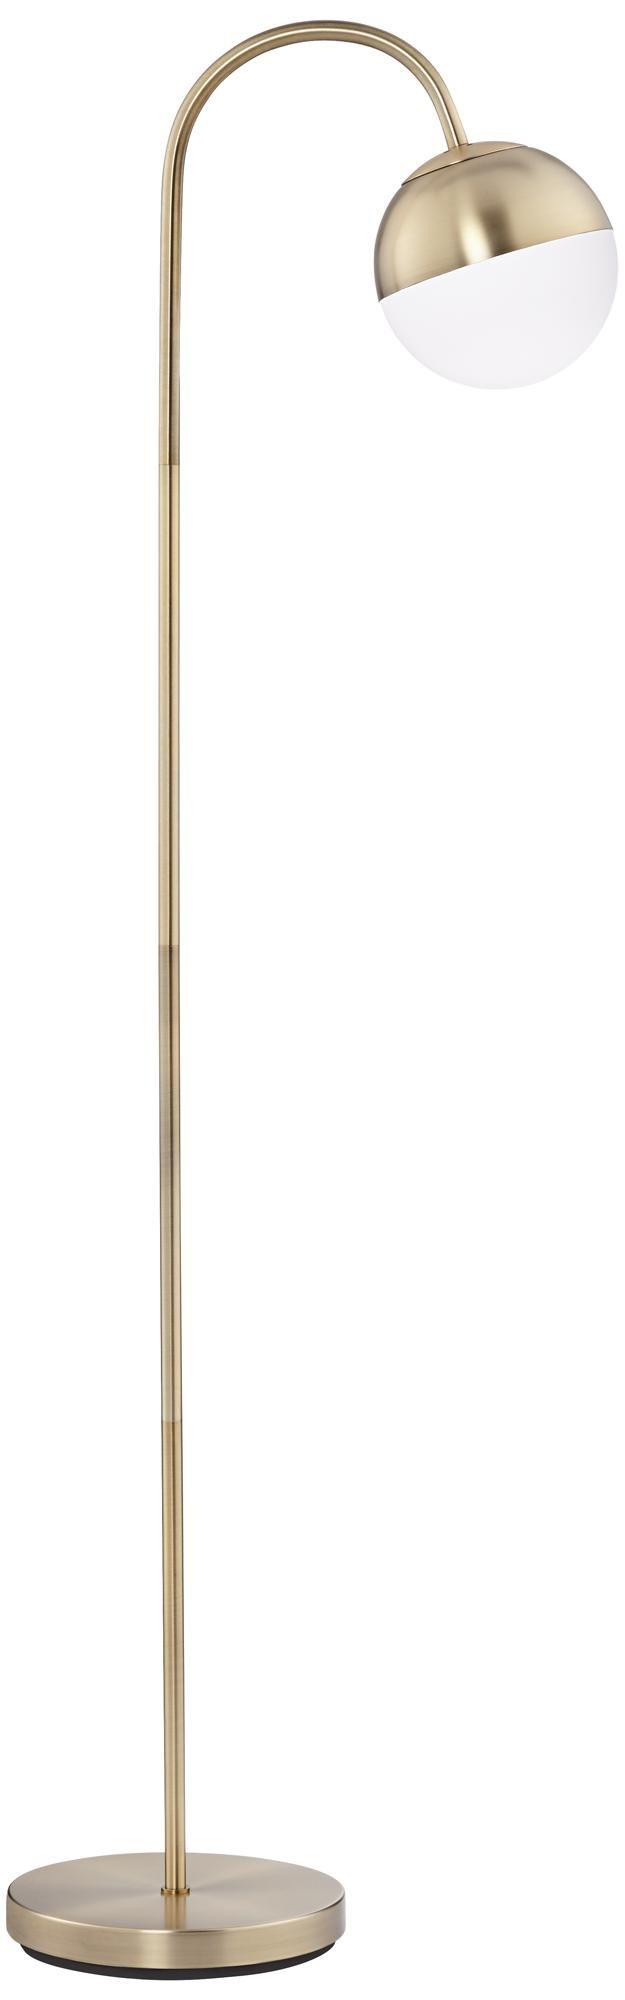 Carlton Globe Brass Finish LED Floor Lamp - #15A06   Lamps Plus